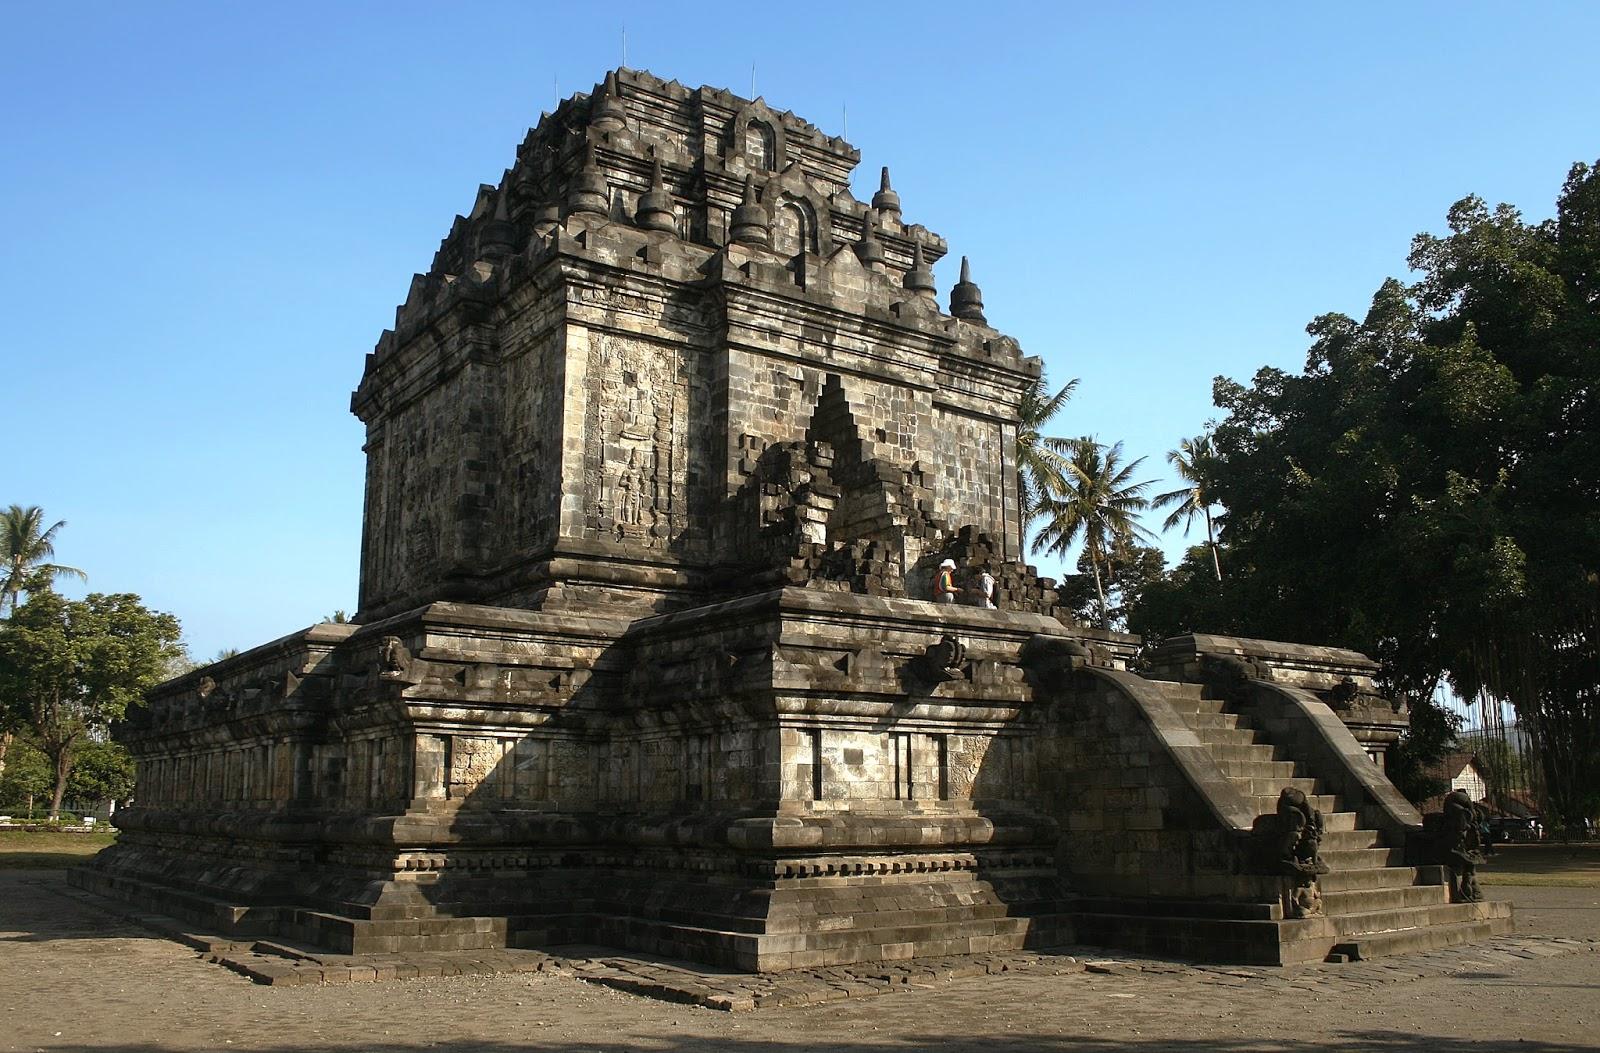 Bukti Peninggalan Agama Dan Kebudayaan Hindu Buddha Di Indonesia